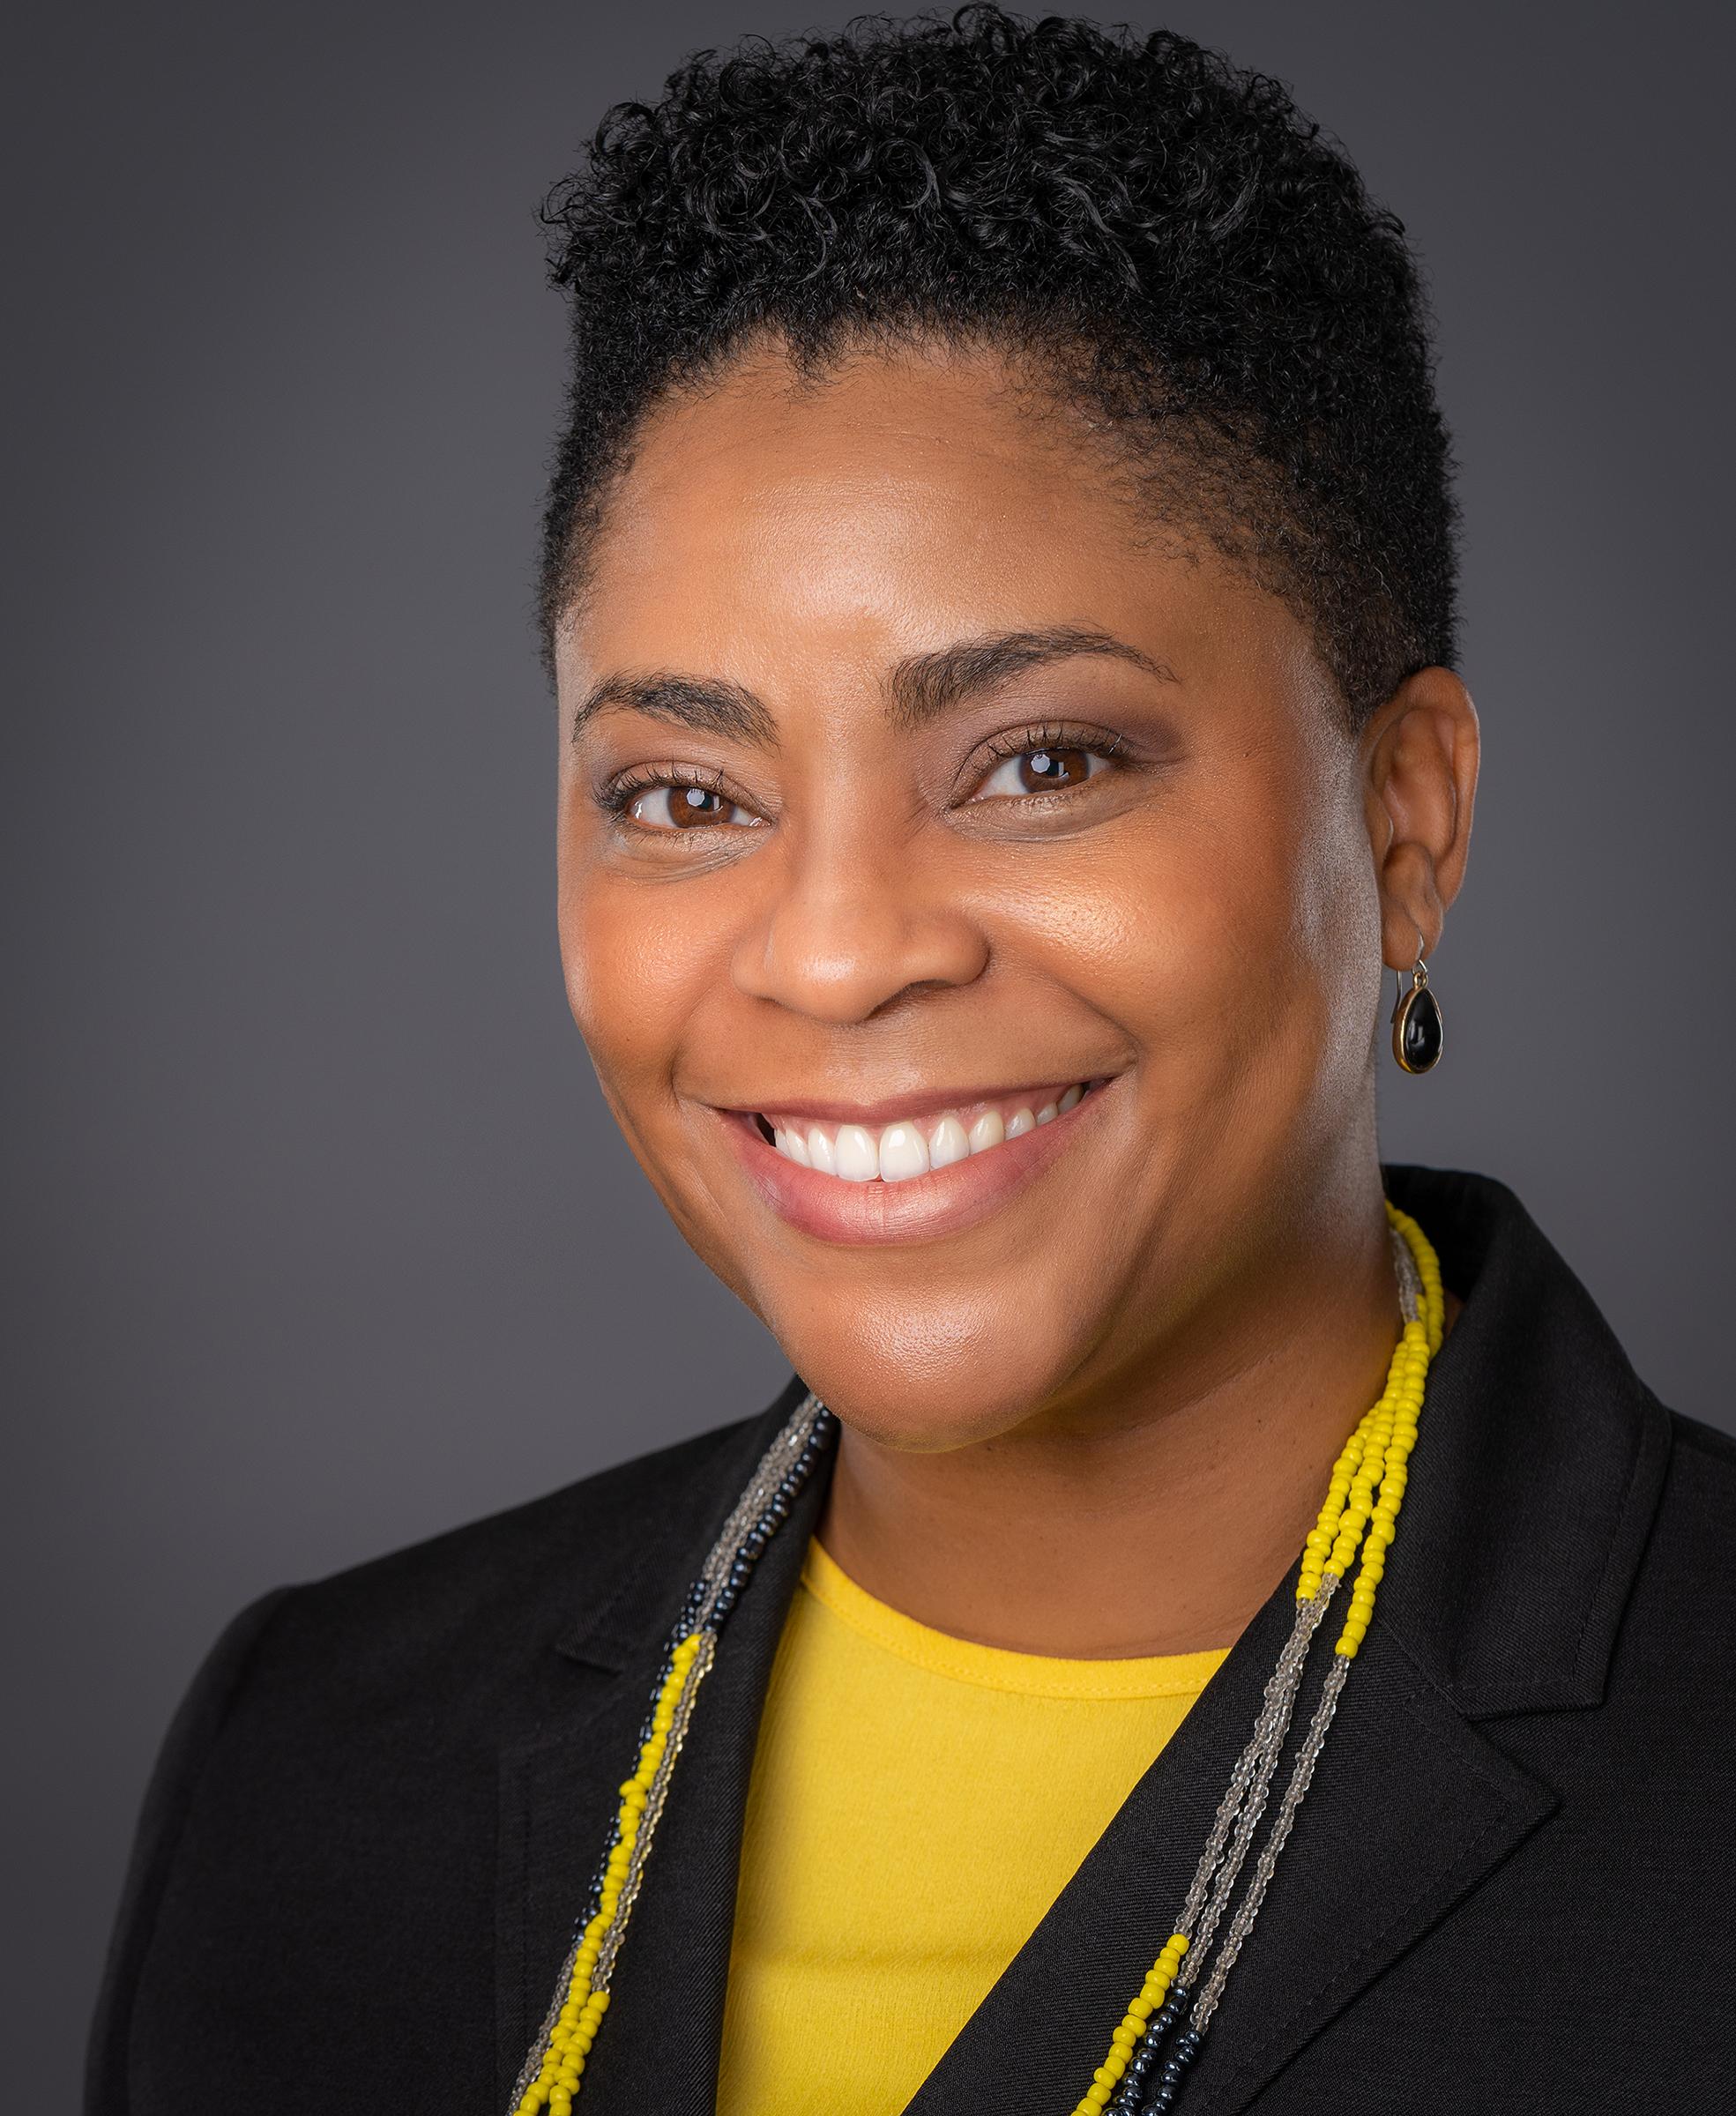 Lakisha Culpepper, Garland ISD Community Liaison